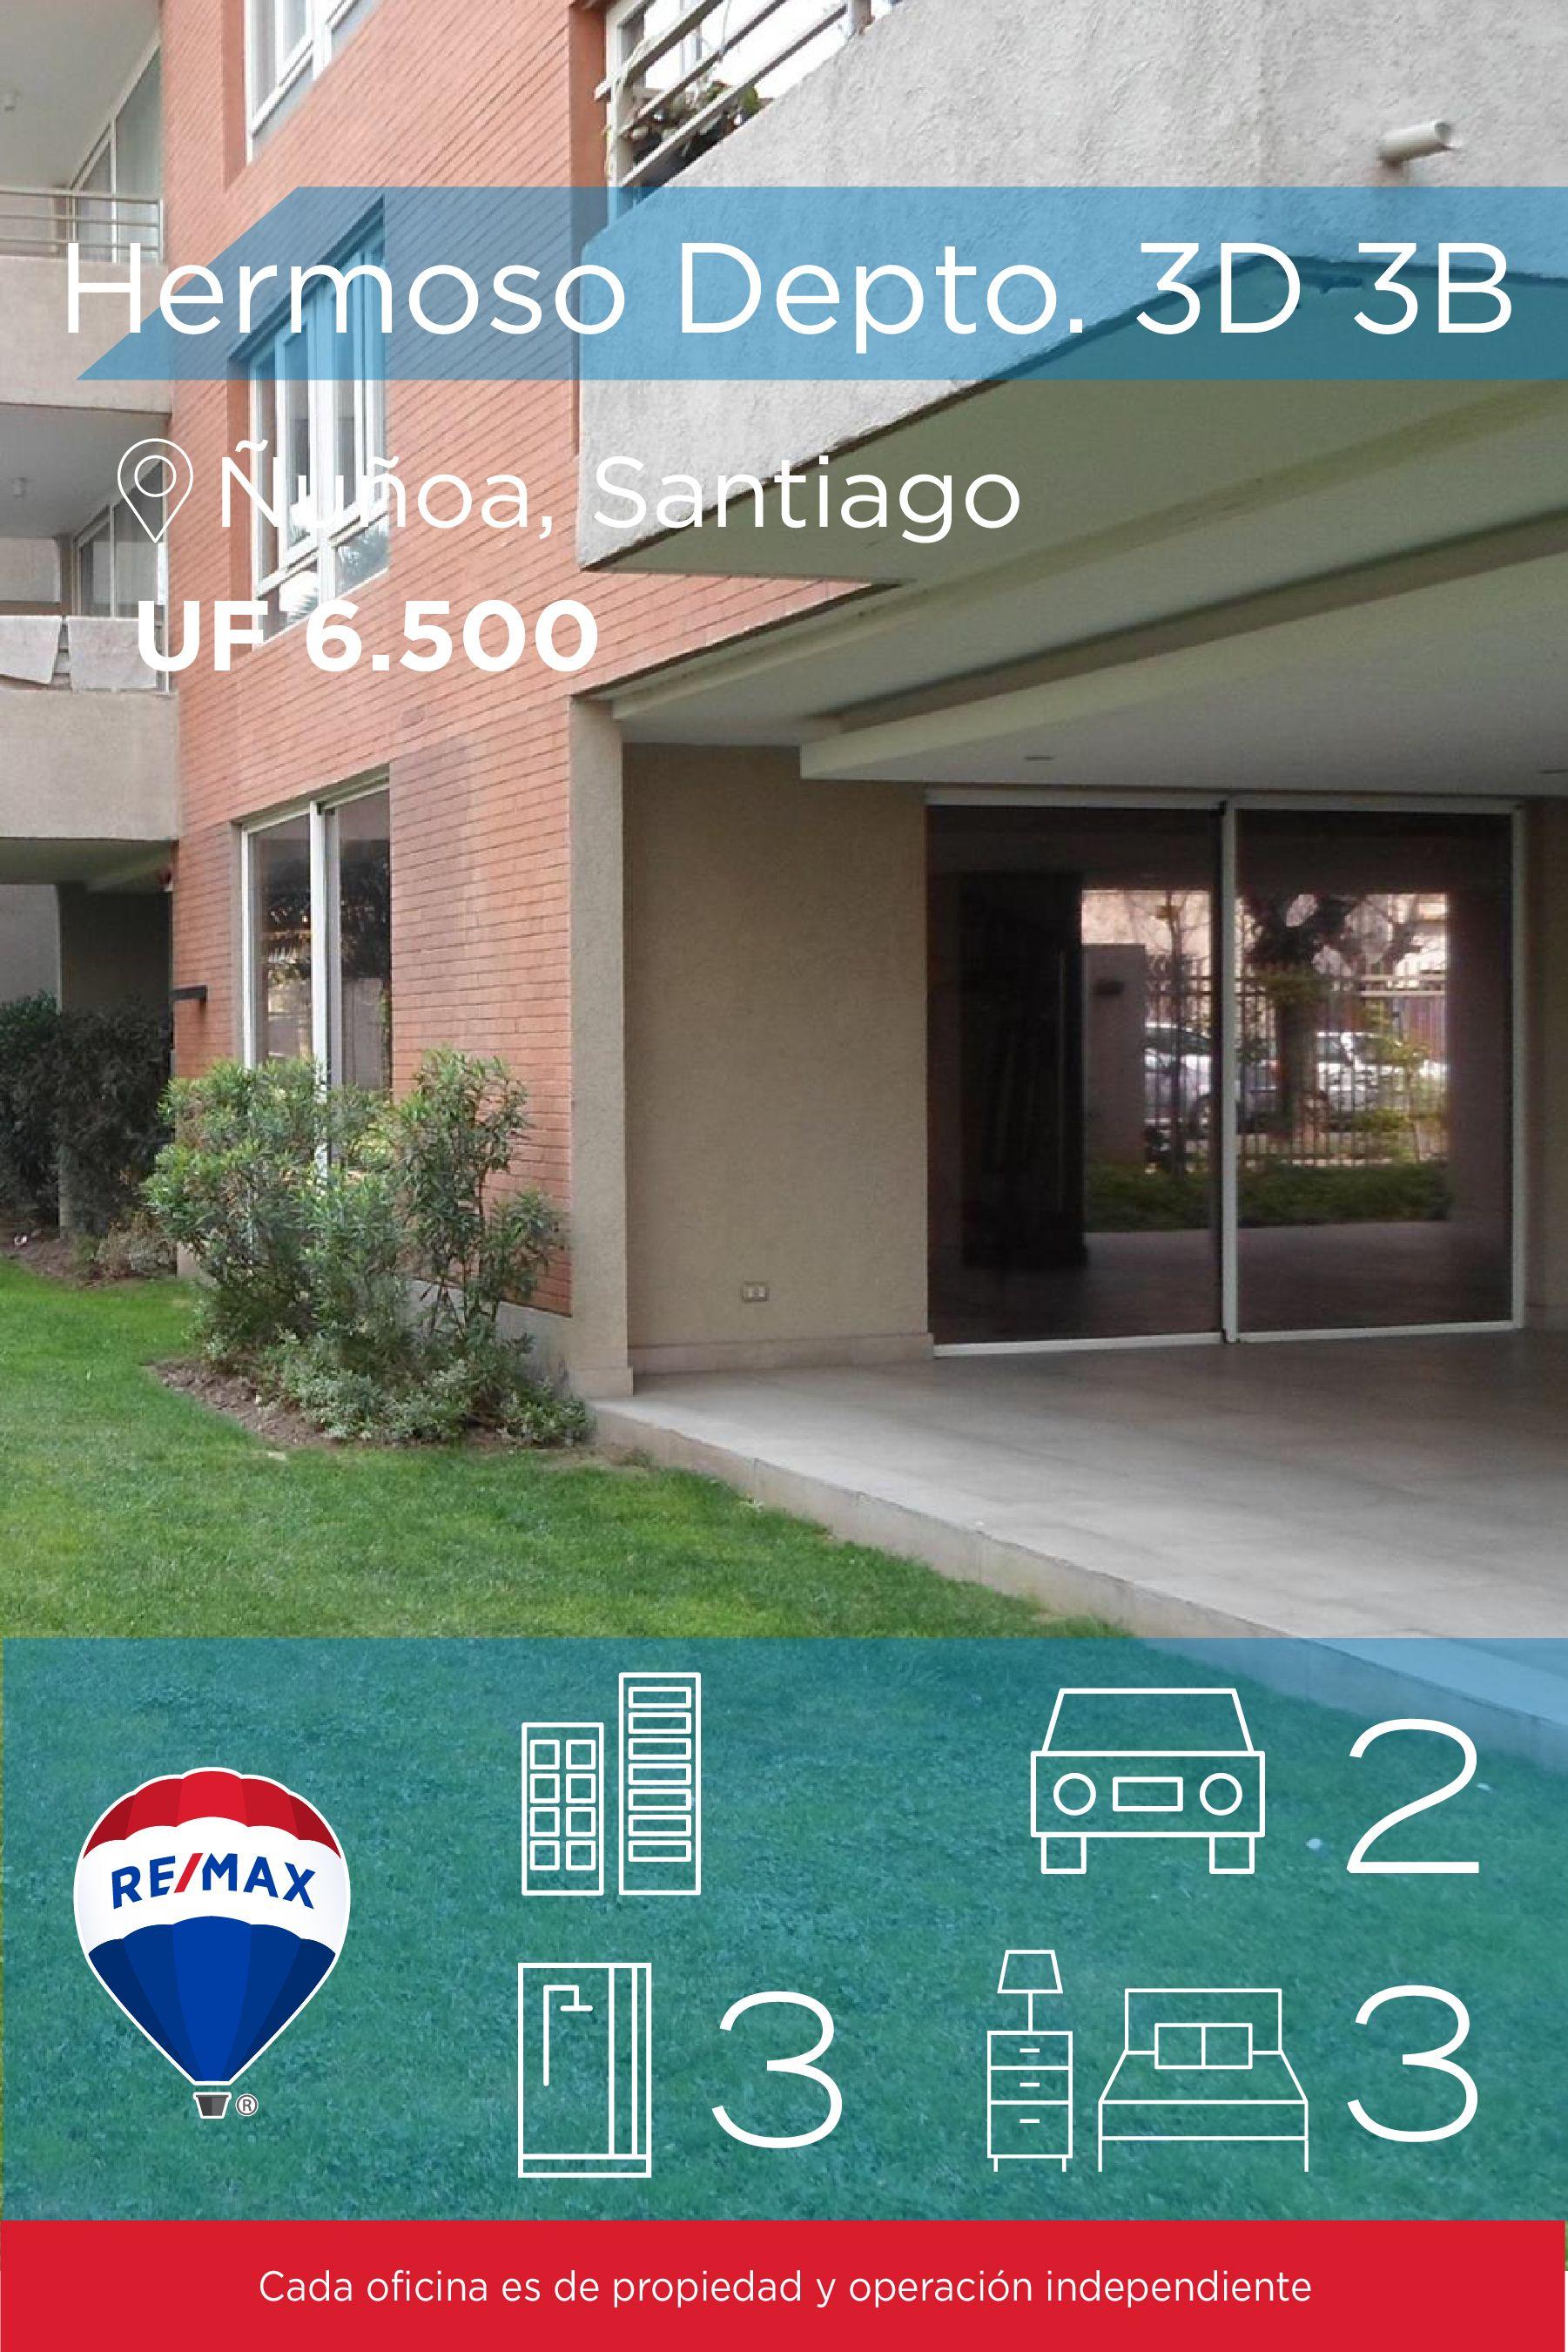 95 M² Departamento Venta, 3 Dormitorios located at Sucre